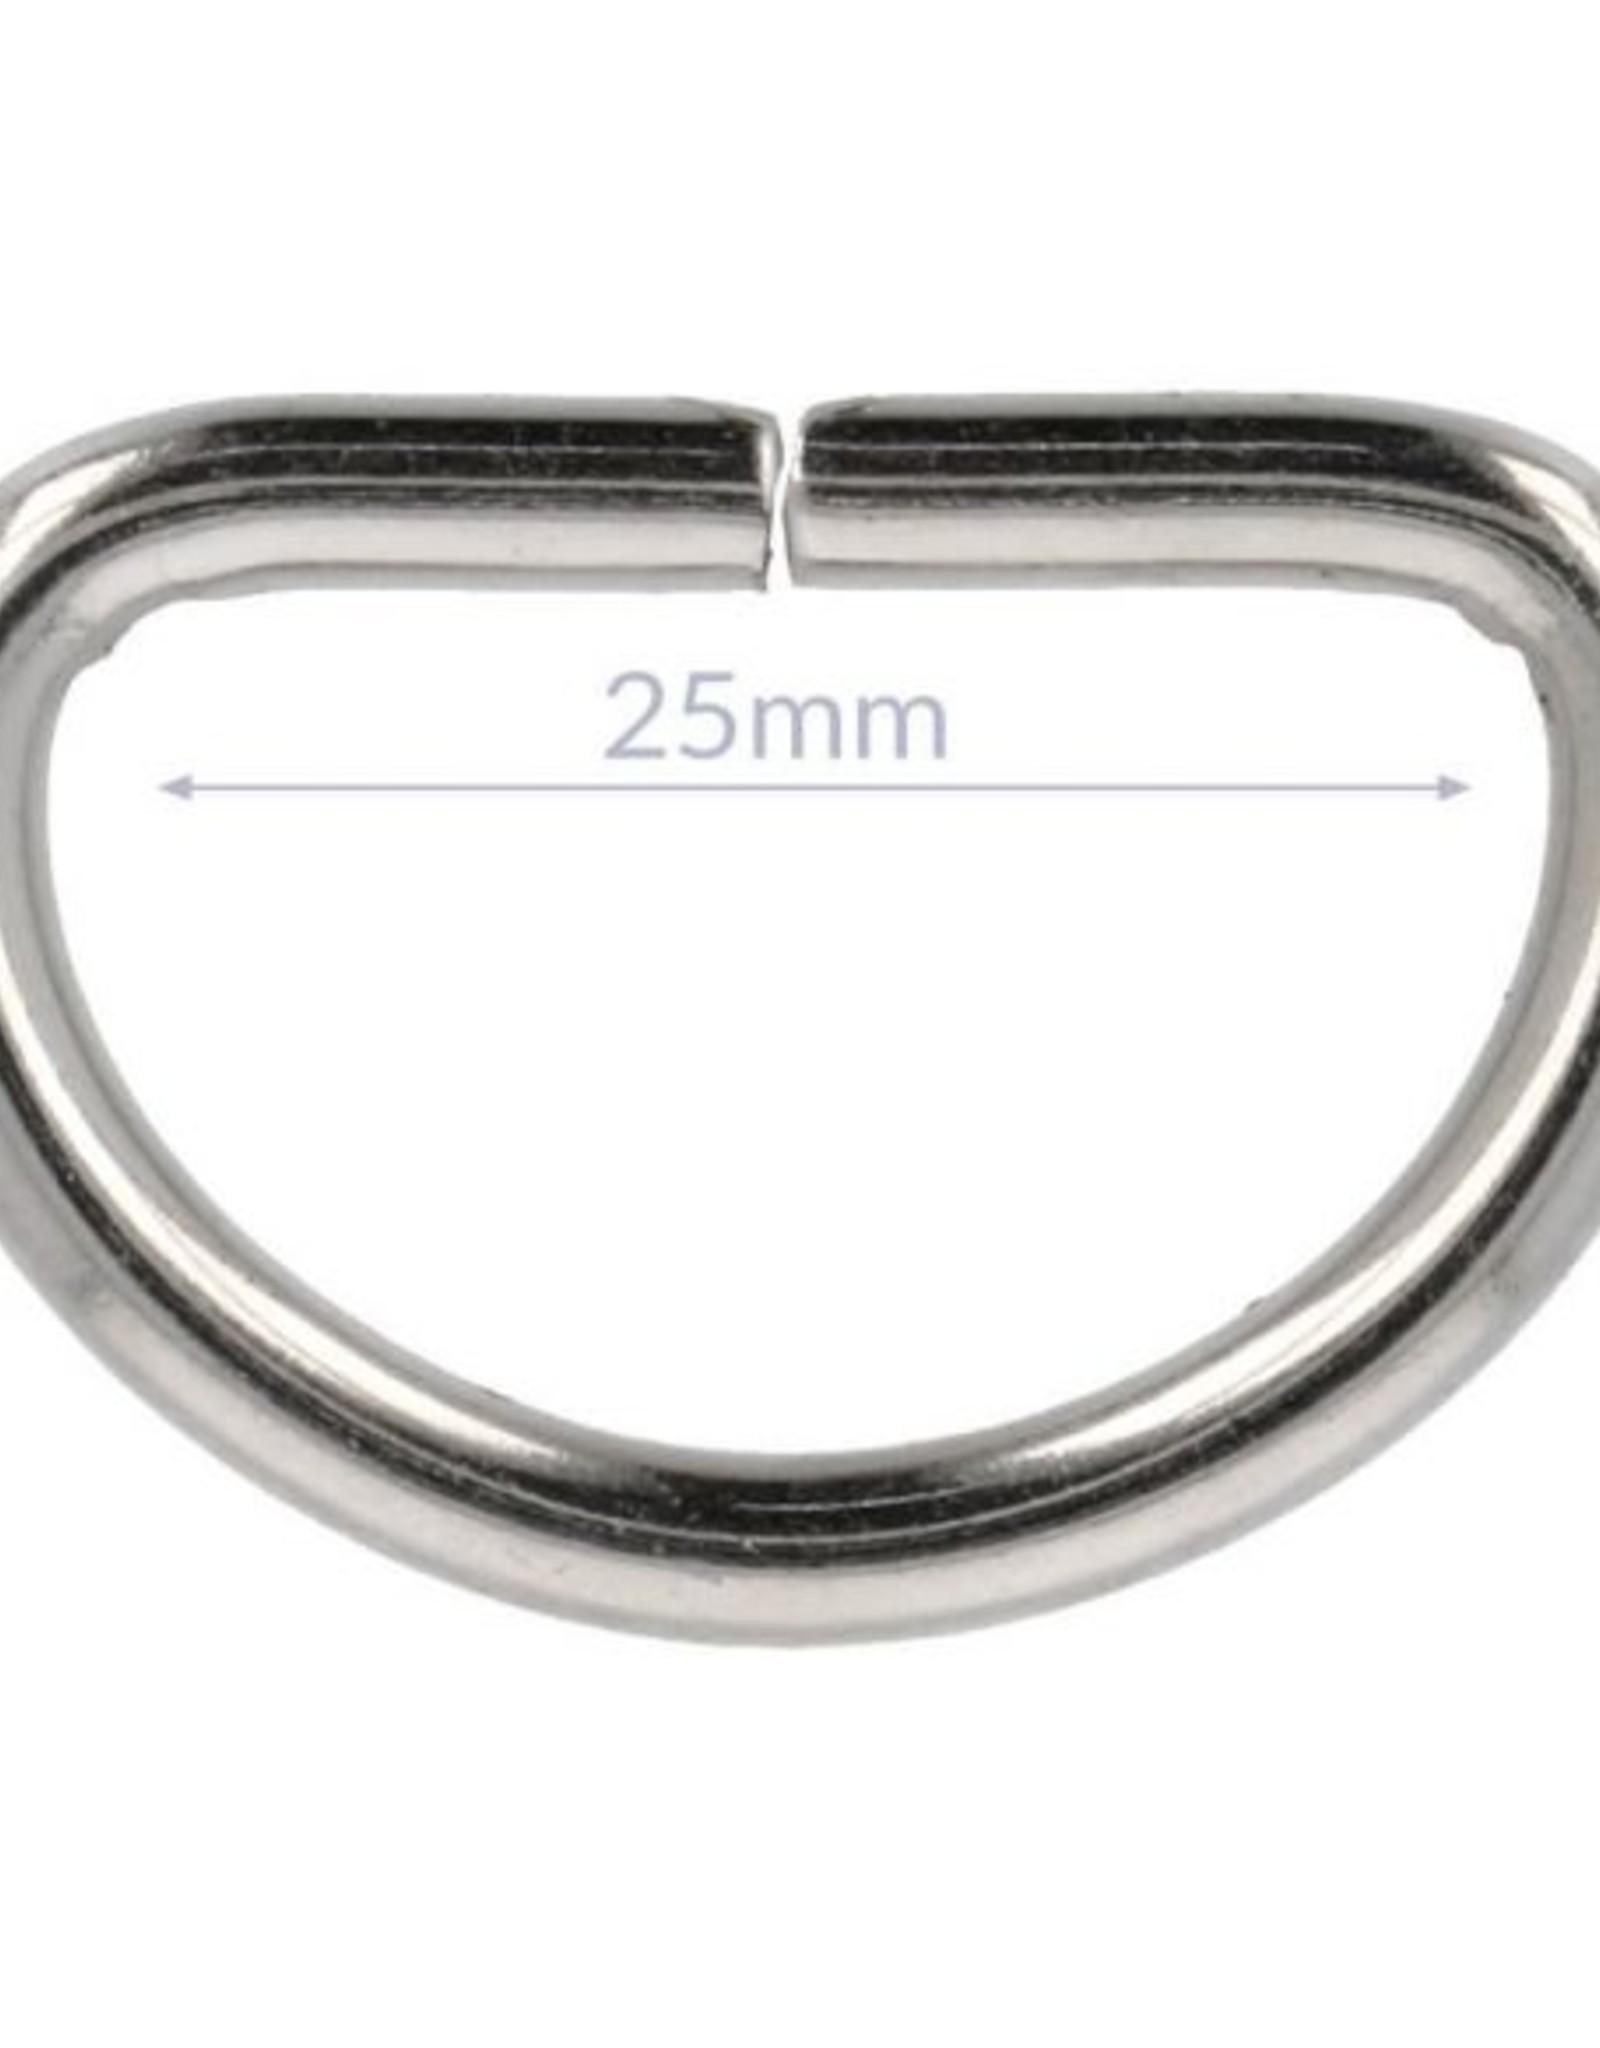 D-ring 25mm